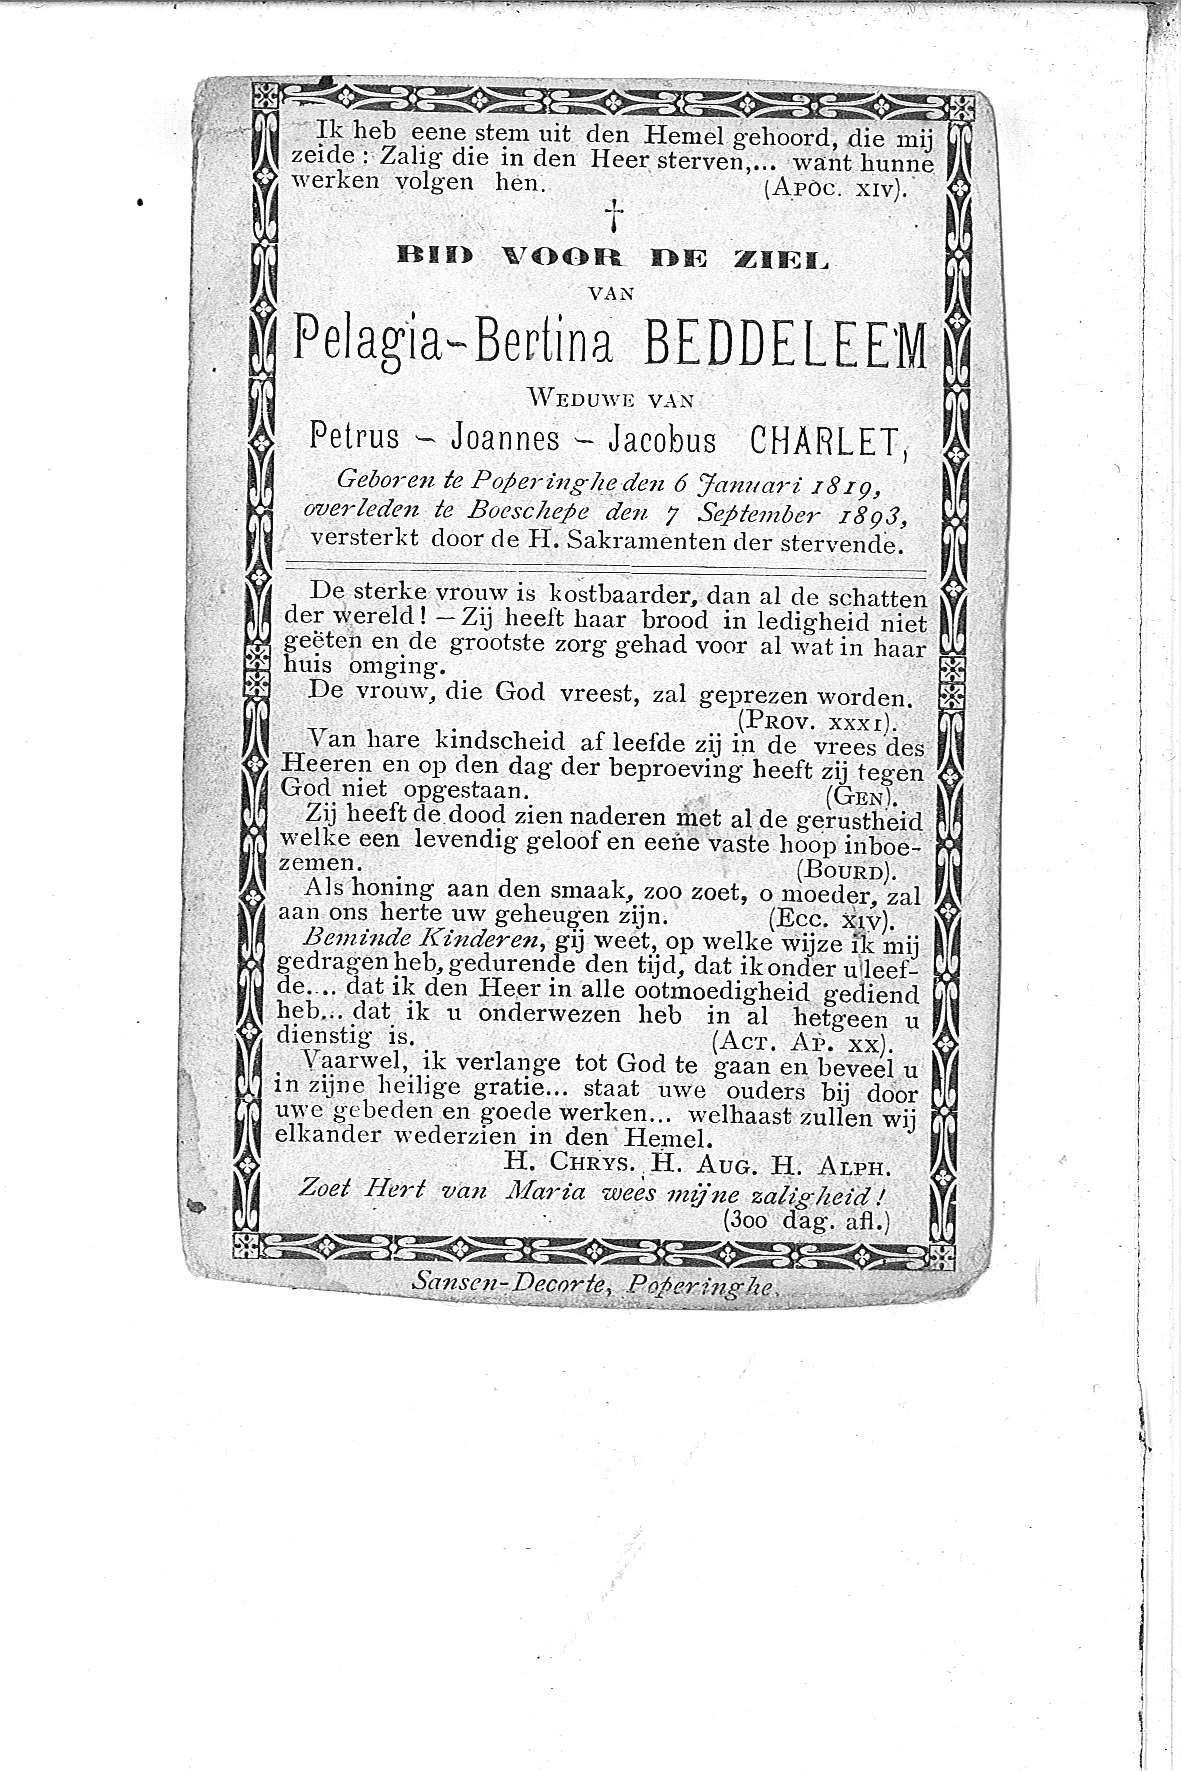 Pelagia-Berlina(1893)20101125100742_00026.jpg